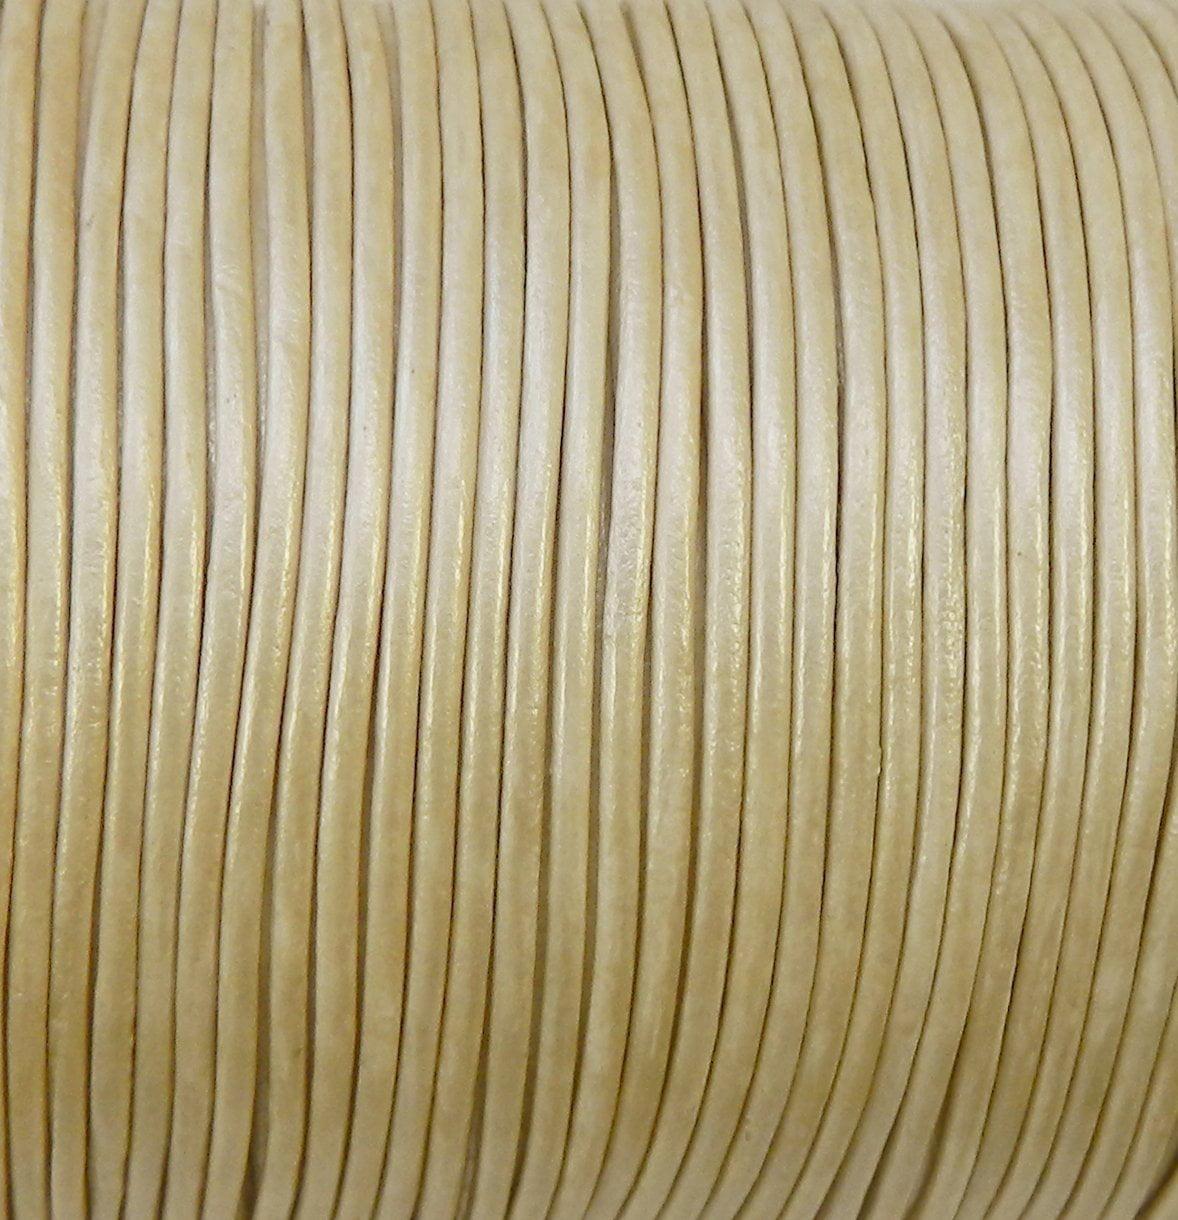 Imported India Leather Cord 2mm Round 5 Yards Metallic Cream 2